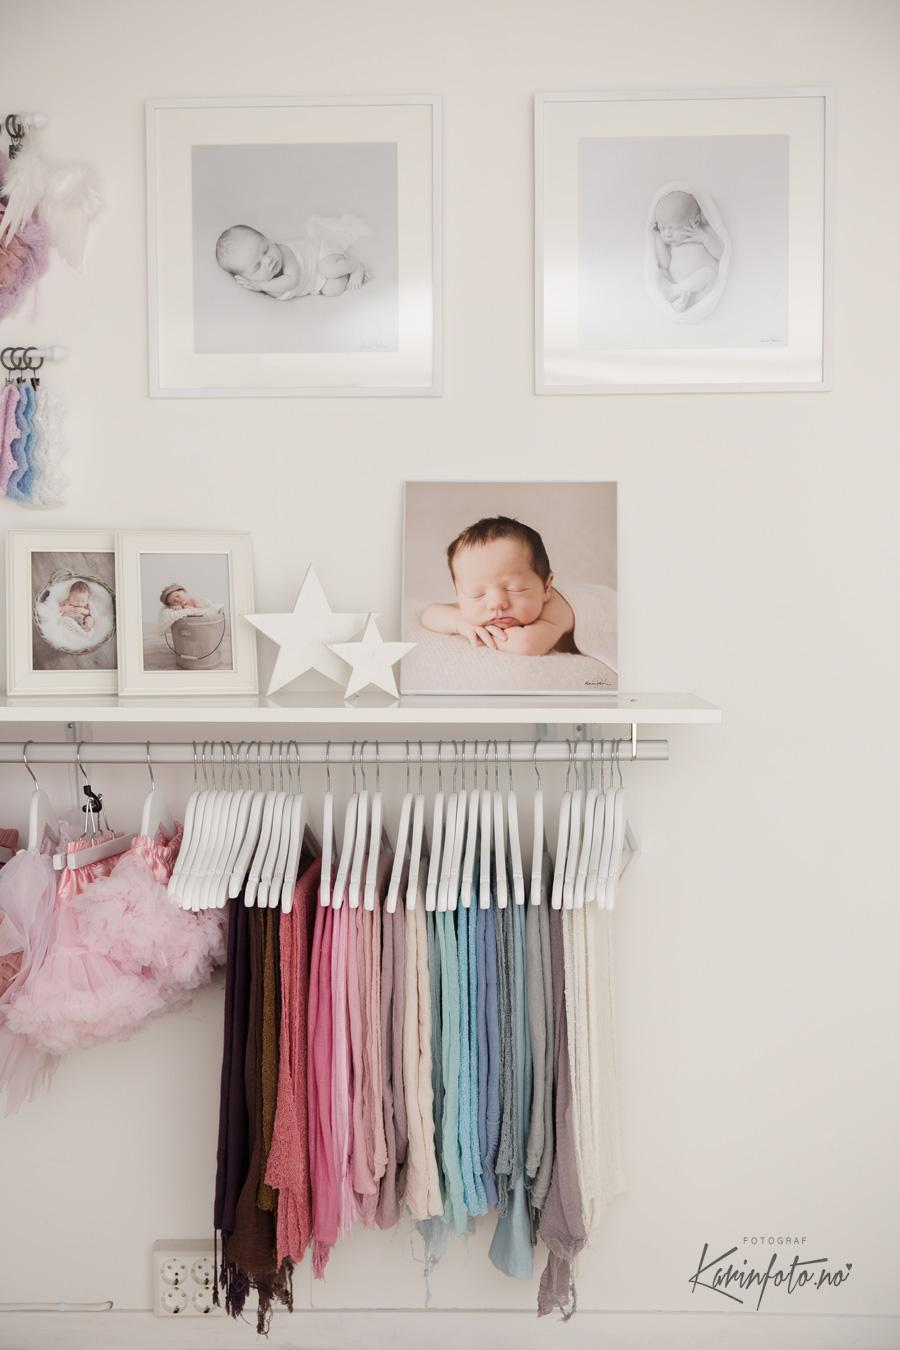 KarinFoto Studio,Nyfødtfoto,Babystudio,Karin Pedersen,Nyfødt;sarpsborg,Østfold,Oslo,Østlandet